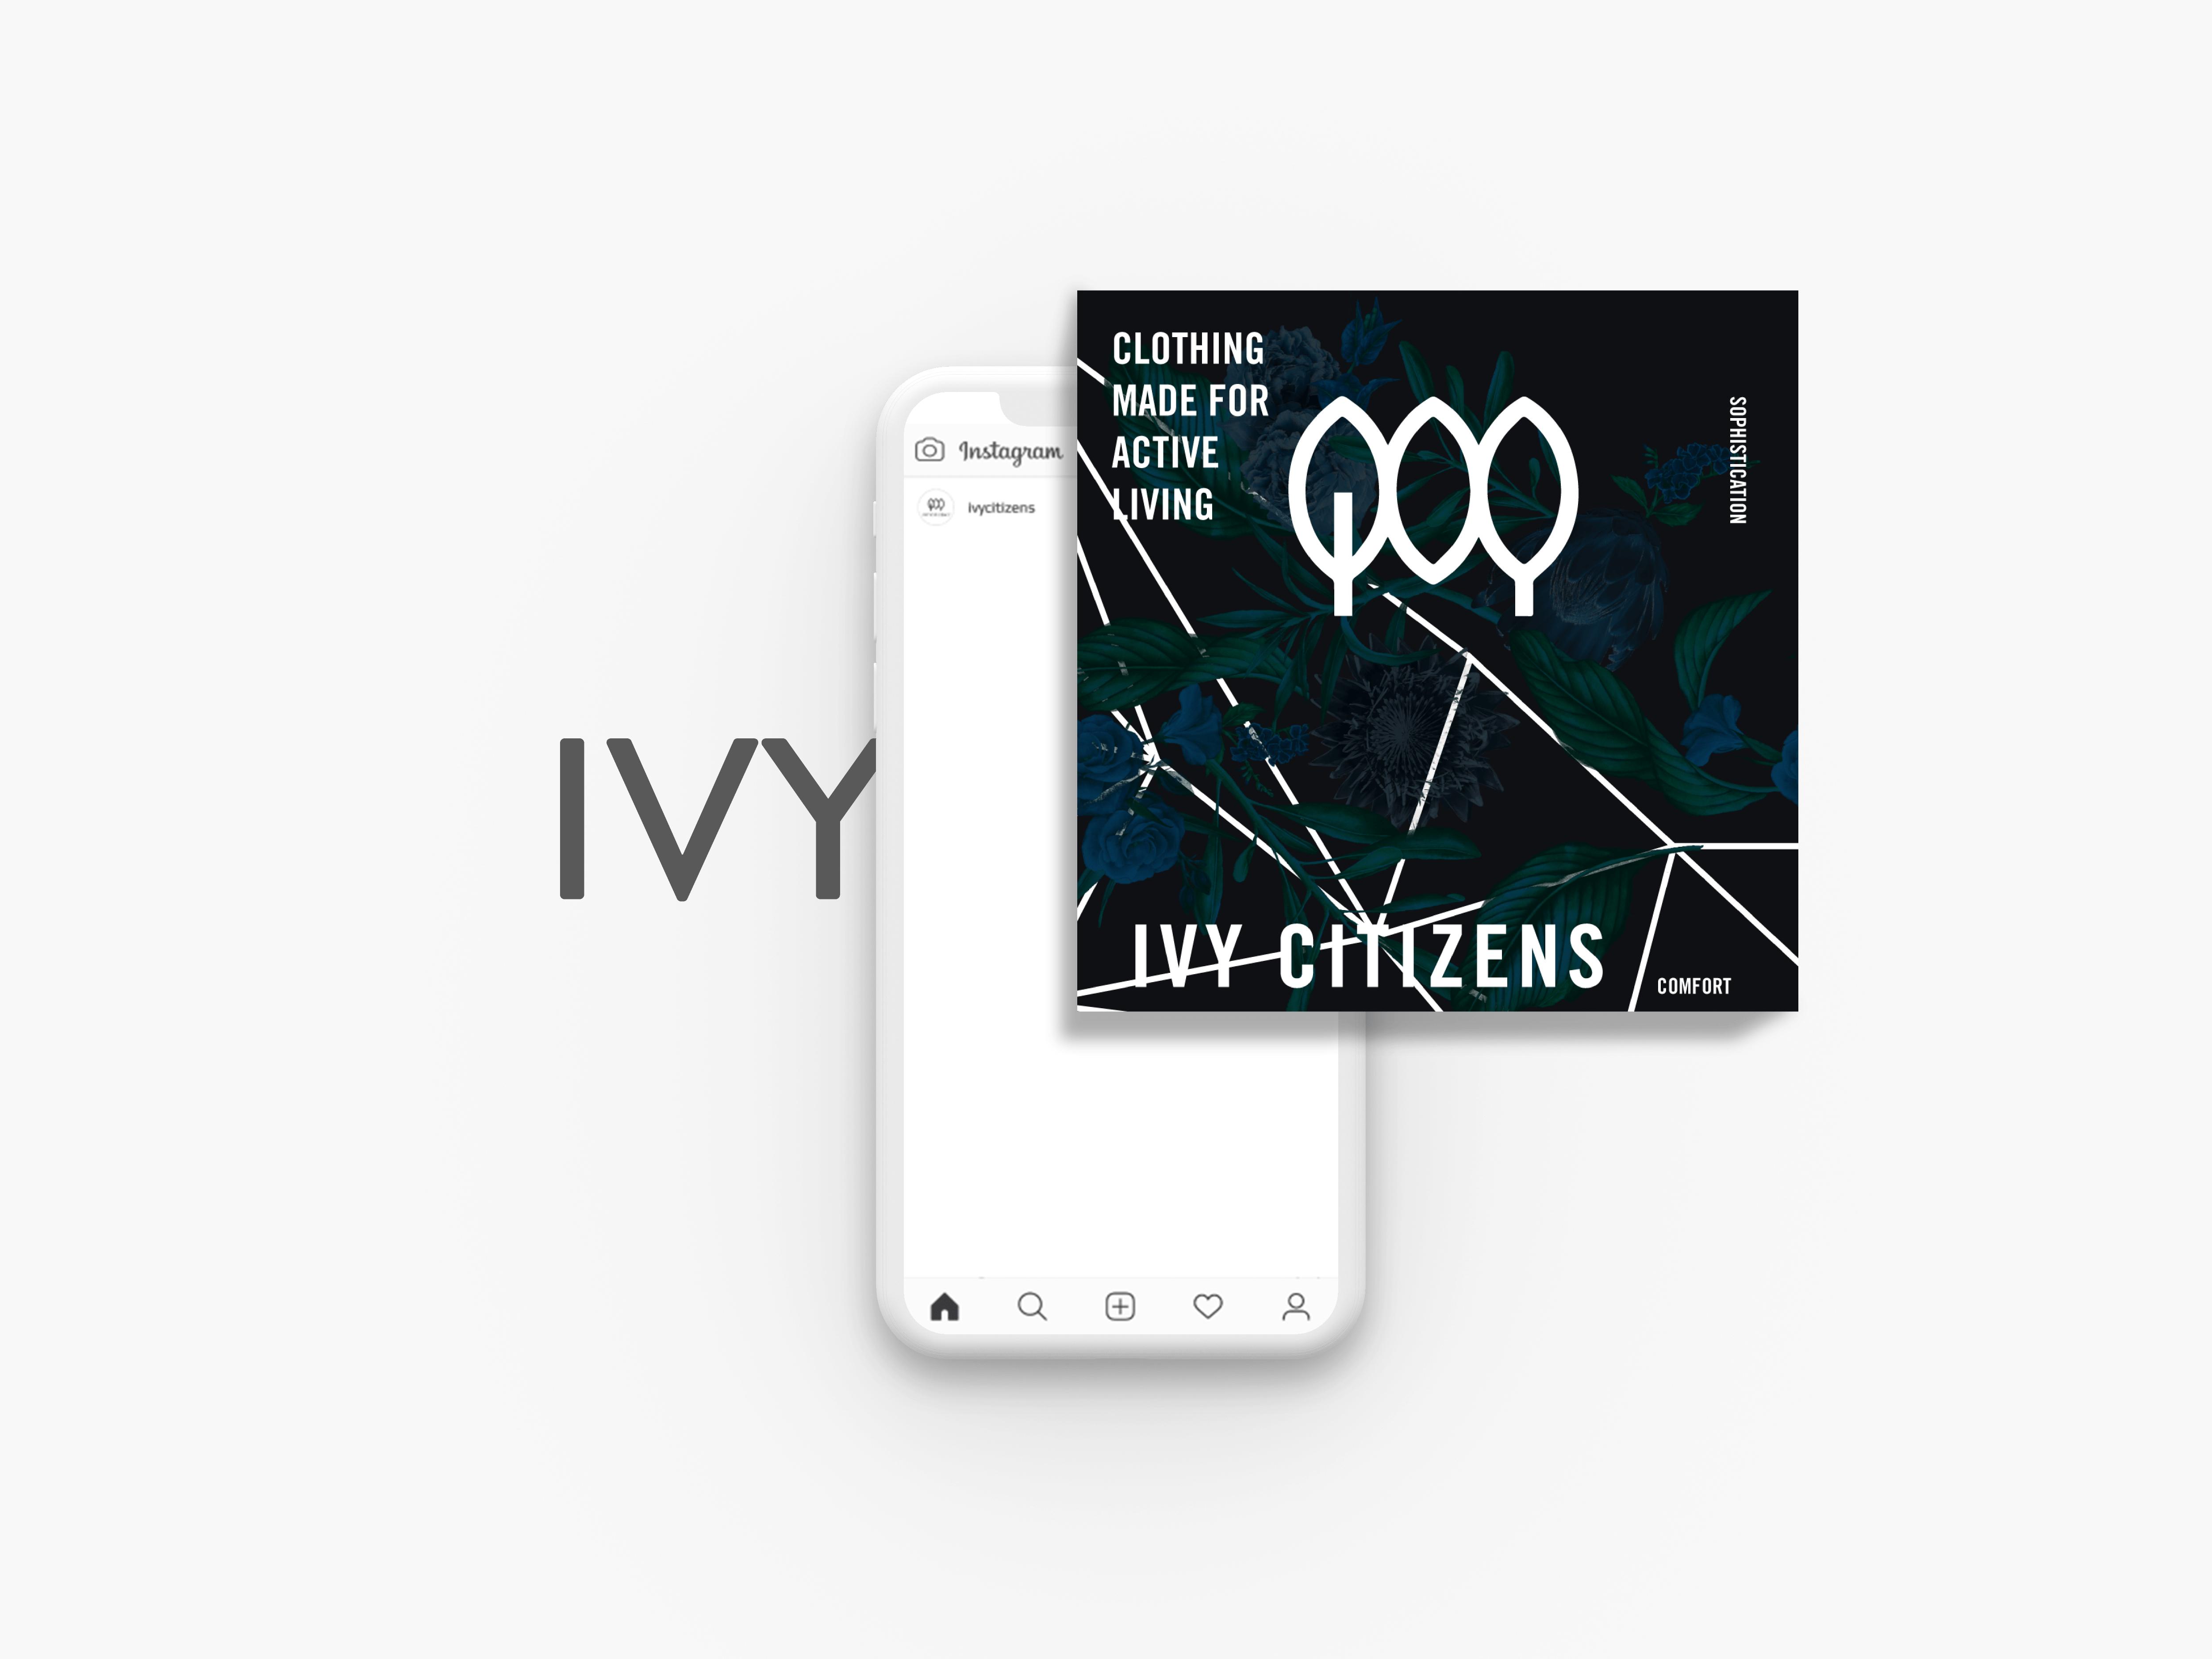 social media designs made for ivy citizens